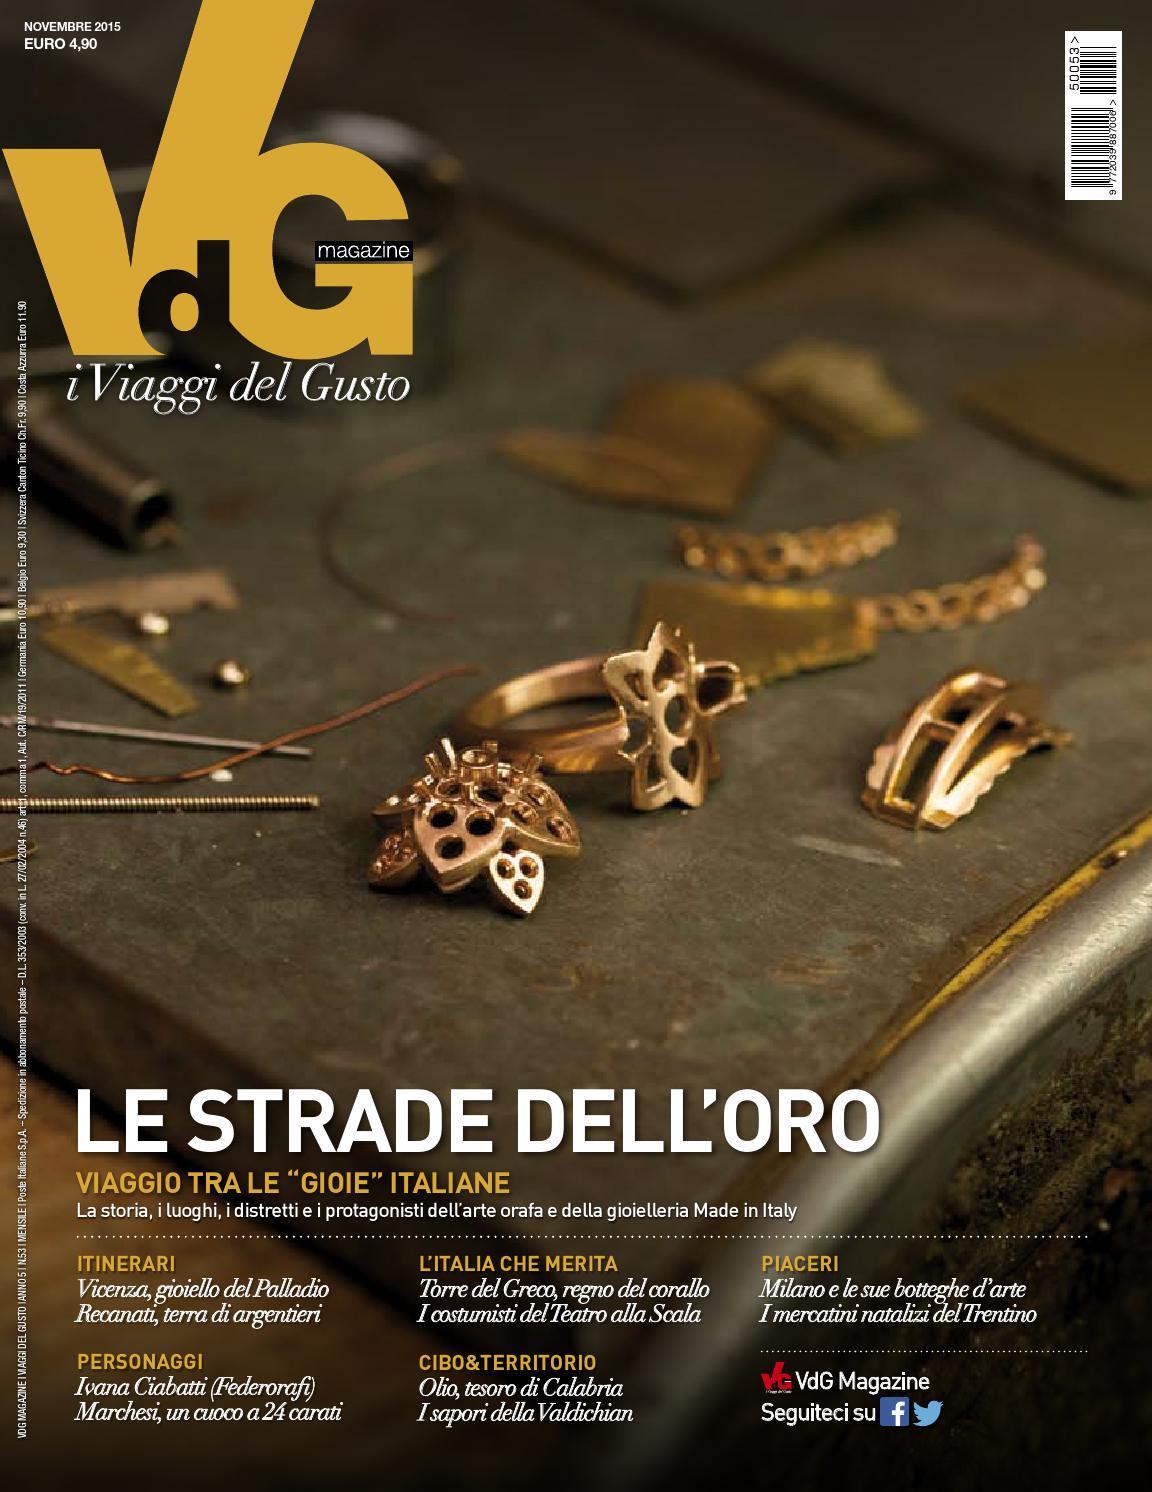 11aa804cf34 VdG novembre 2015 by vdgmagazine - issuu